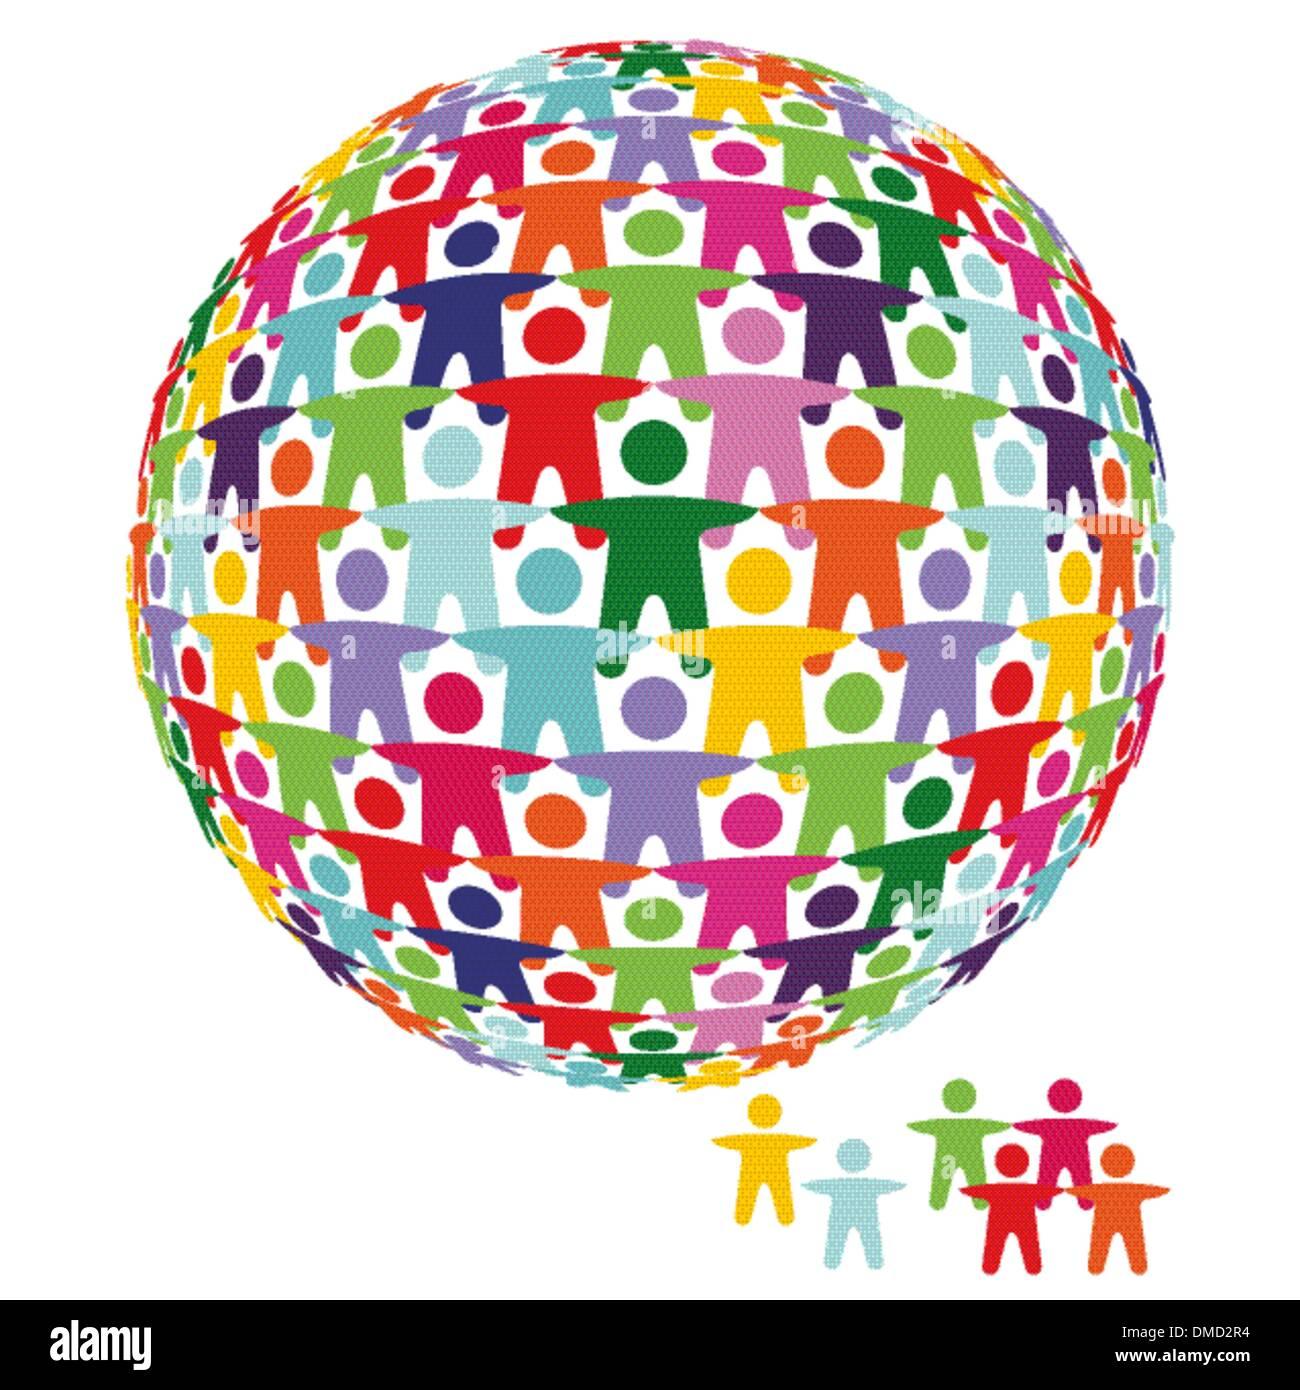 Partnership and solidarity - Stock Image